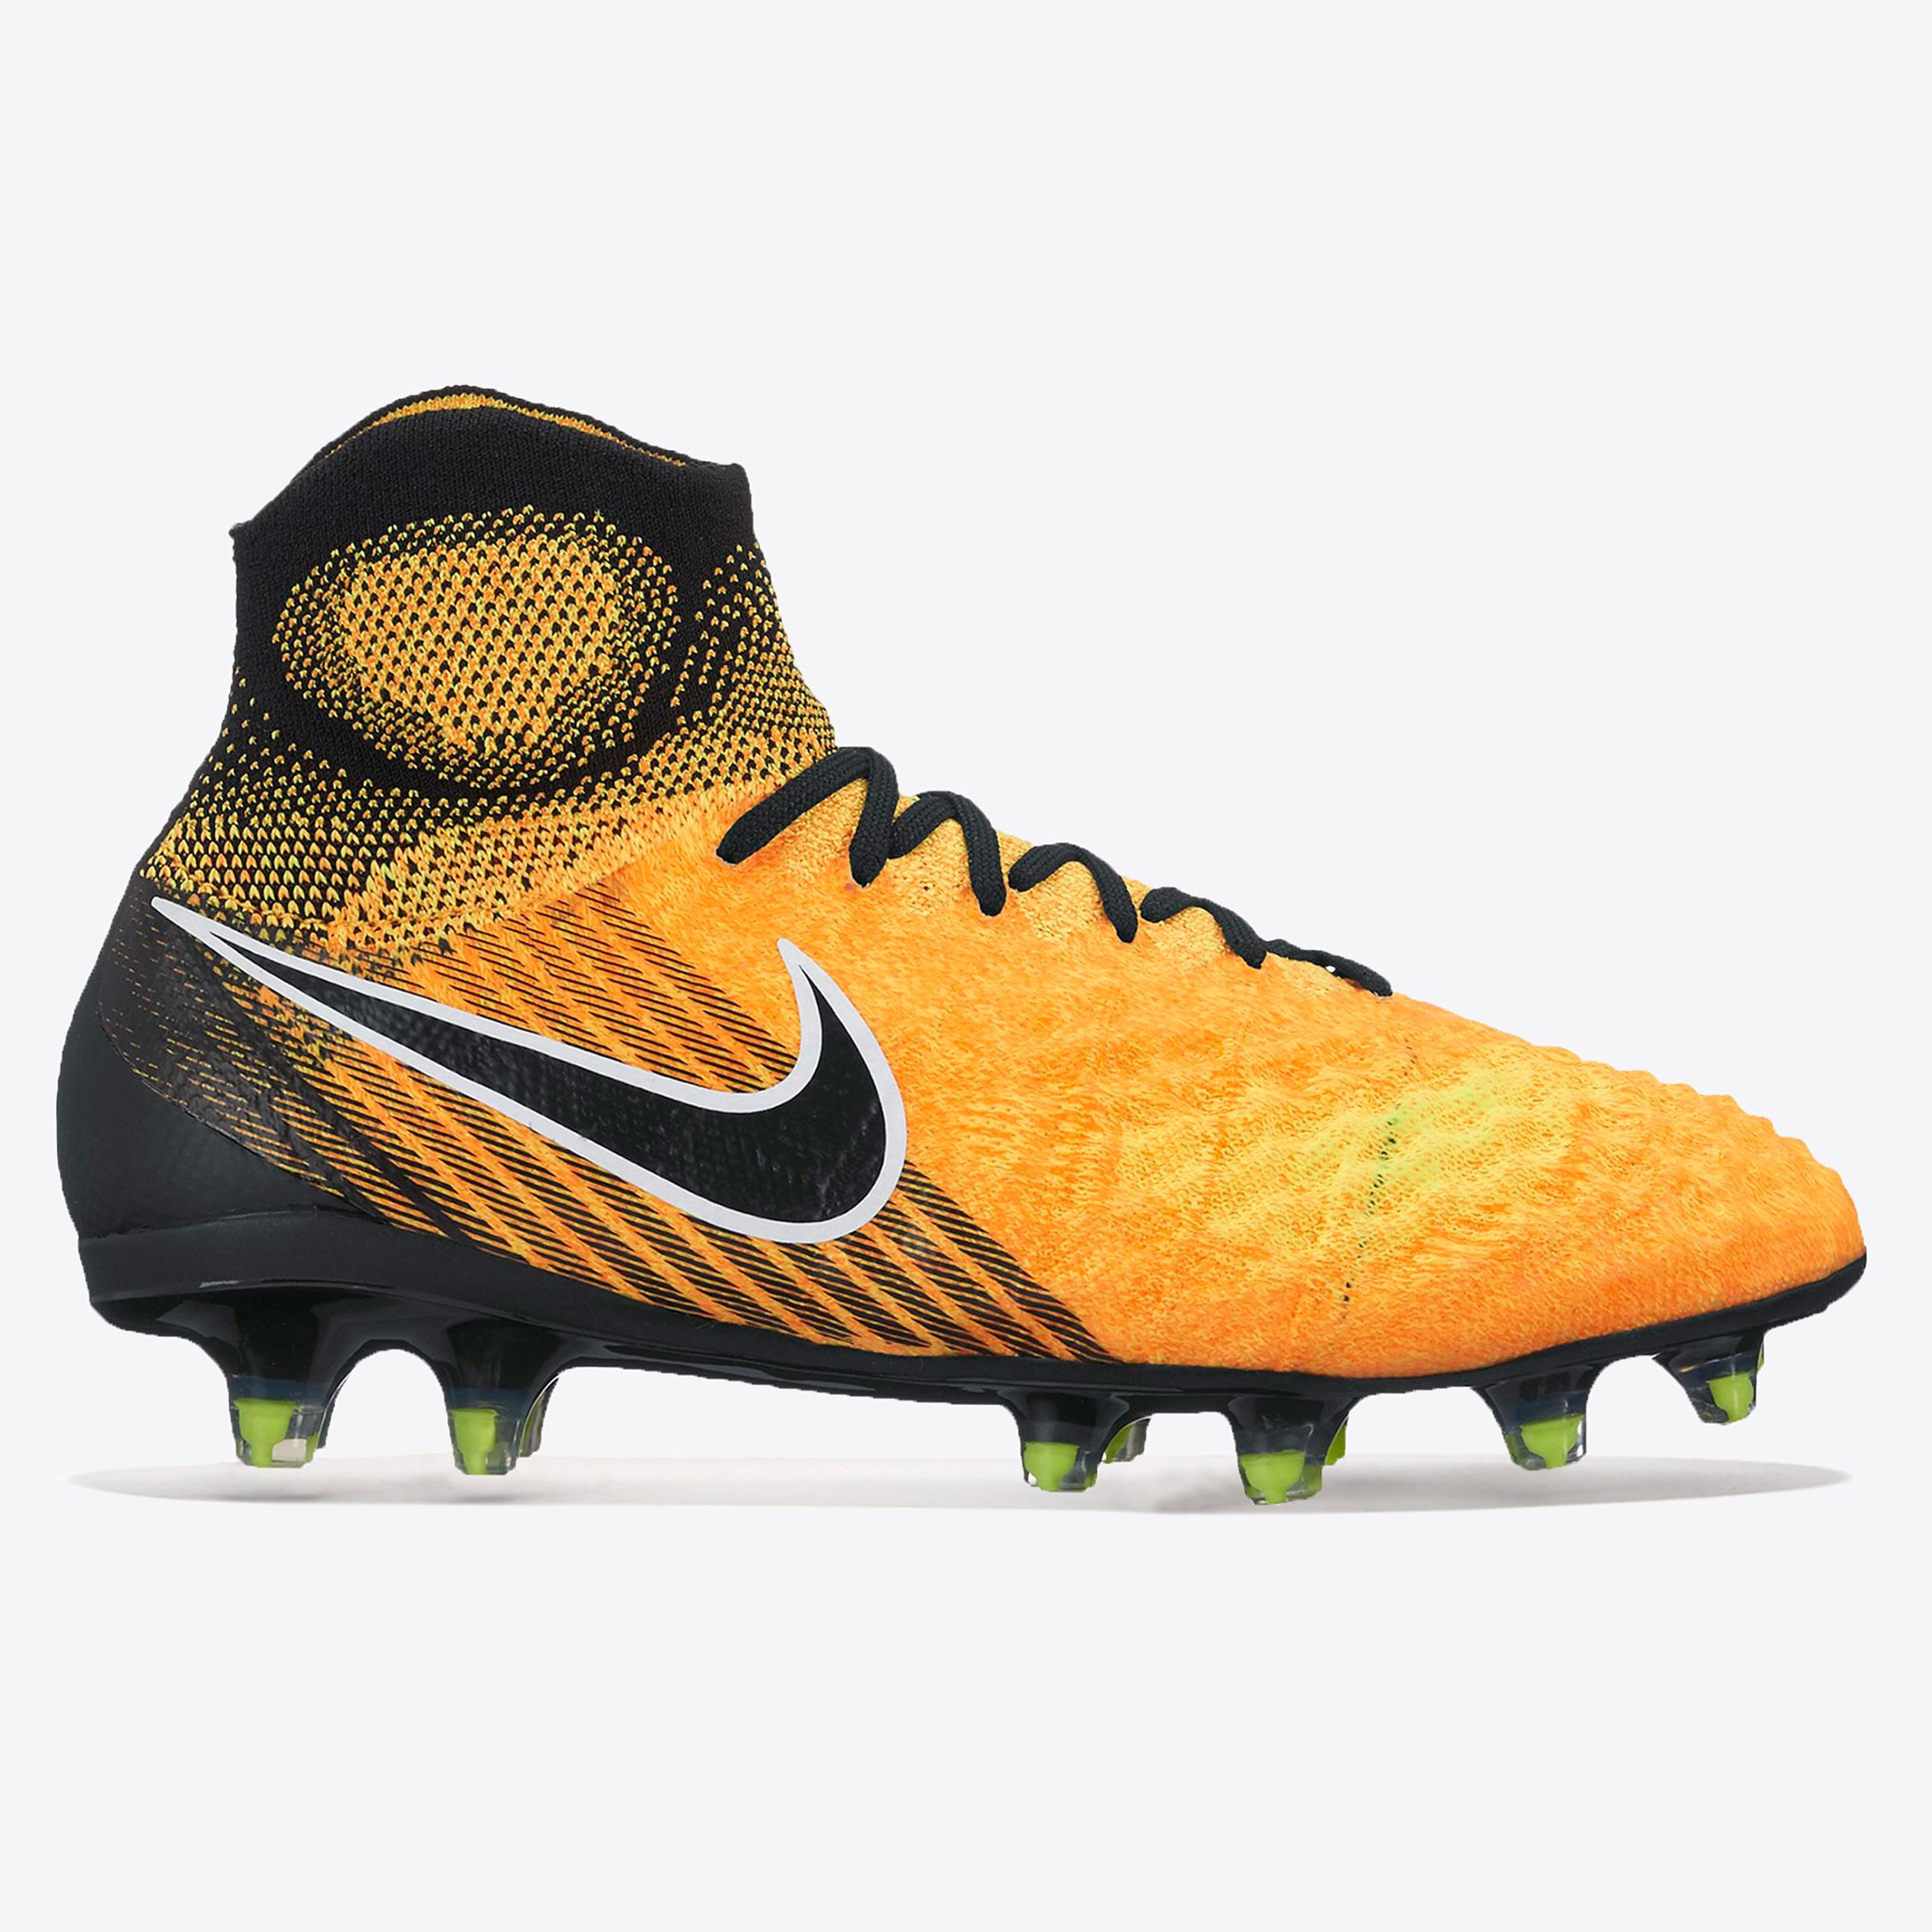 Nike Magista Obra II Firm Ground Football Boots - Laser Orange/Black/W